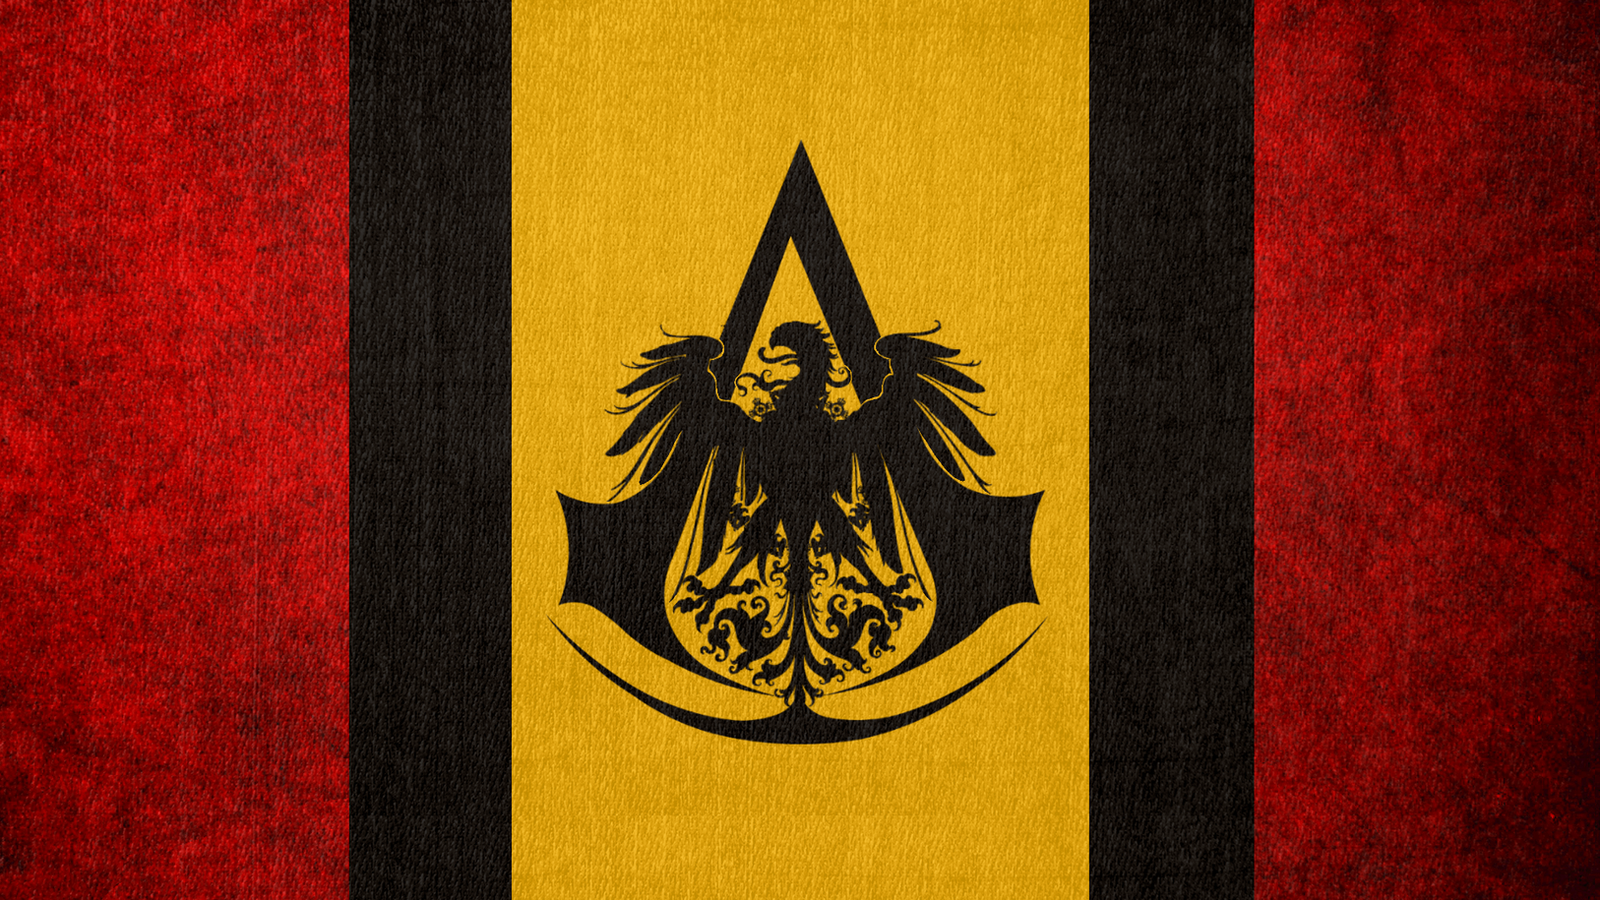 assassin 39 s creed flag of the german bureau by okiir on deviantart. Black Bedroom Furniture Sets. Home Design Ideas